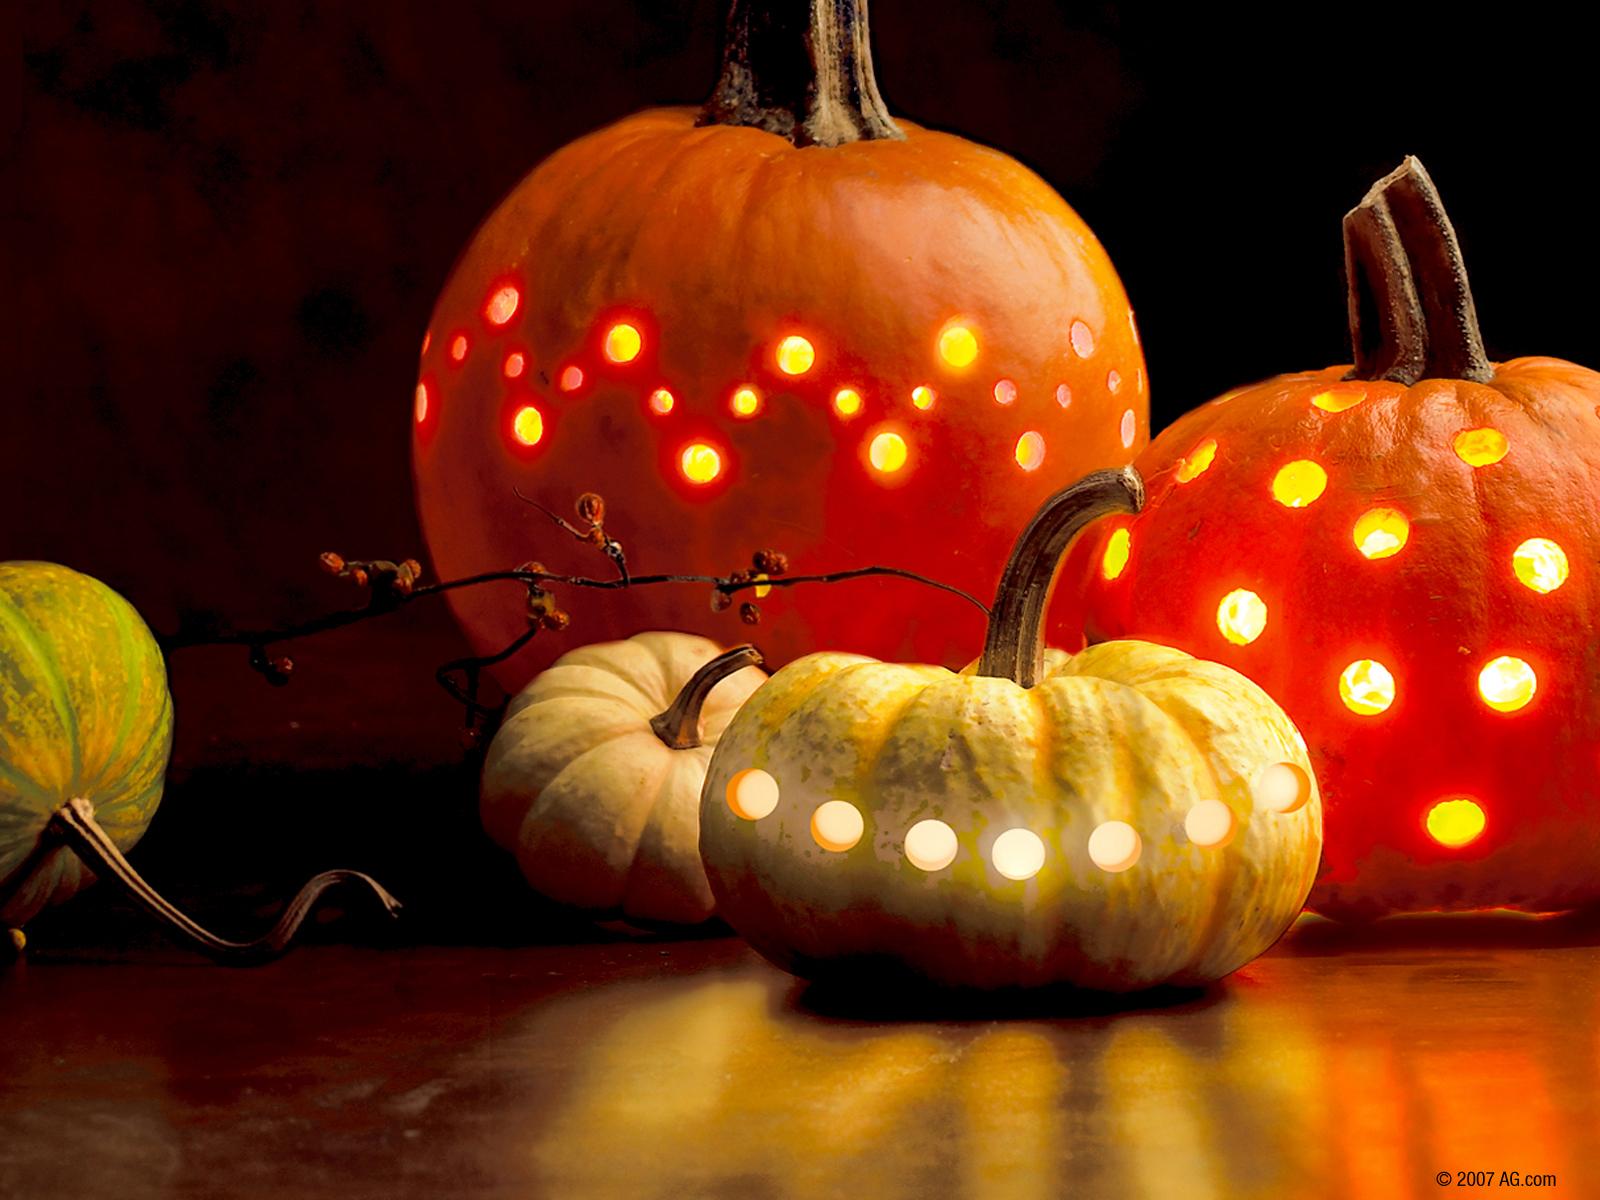 American greetings halloween screensavers the halloween owl american greetings halloween screensavers m4hsunfo